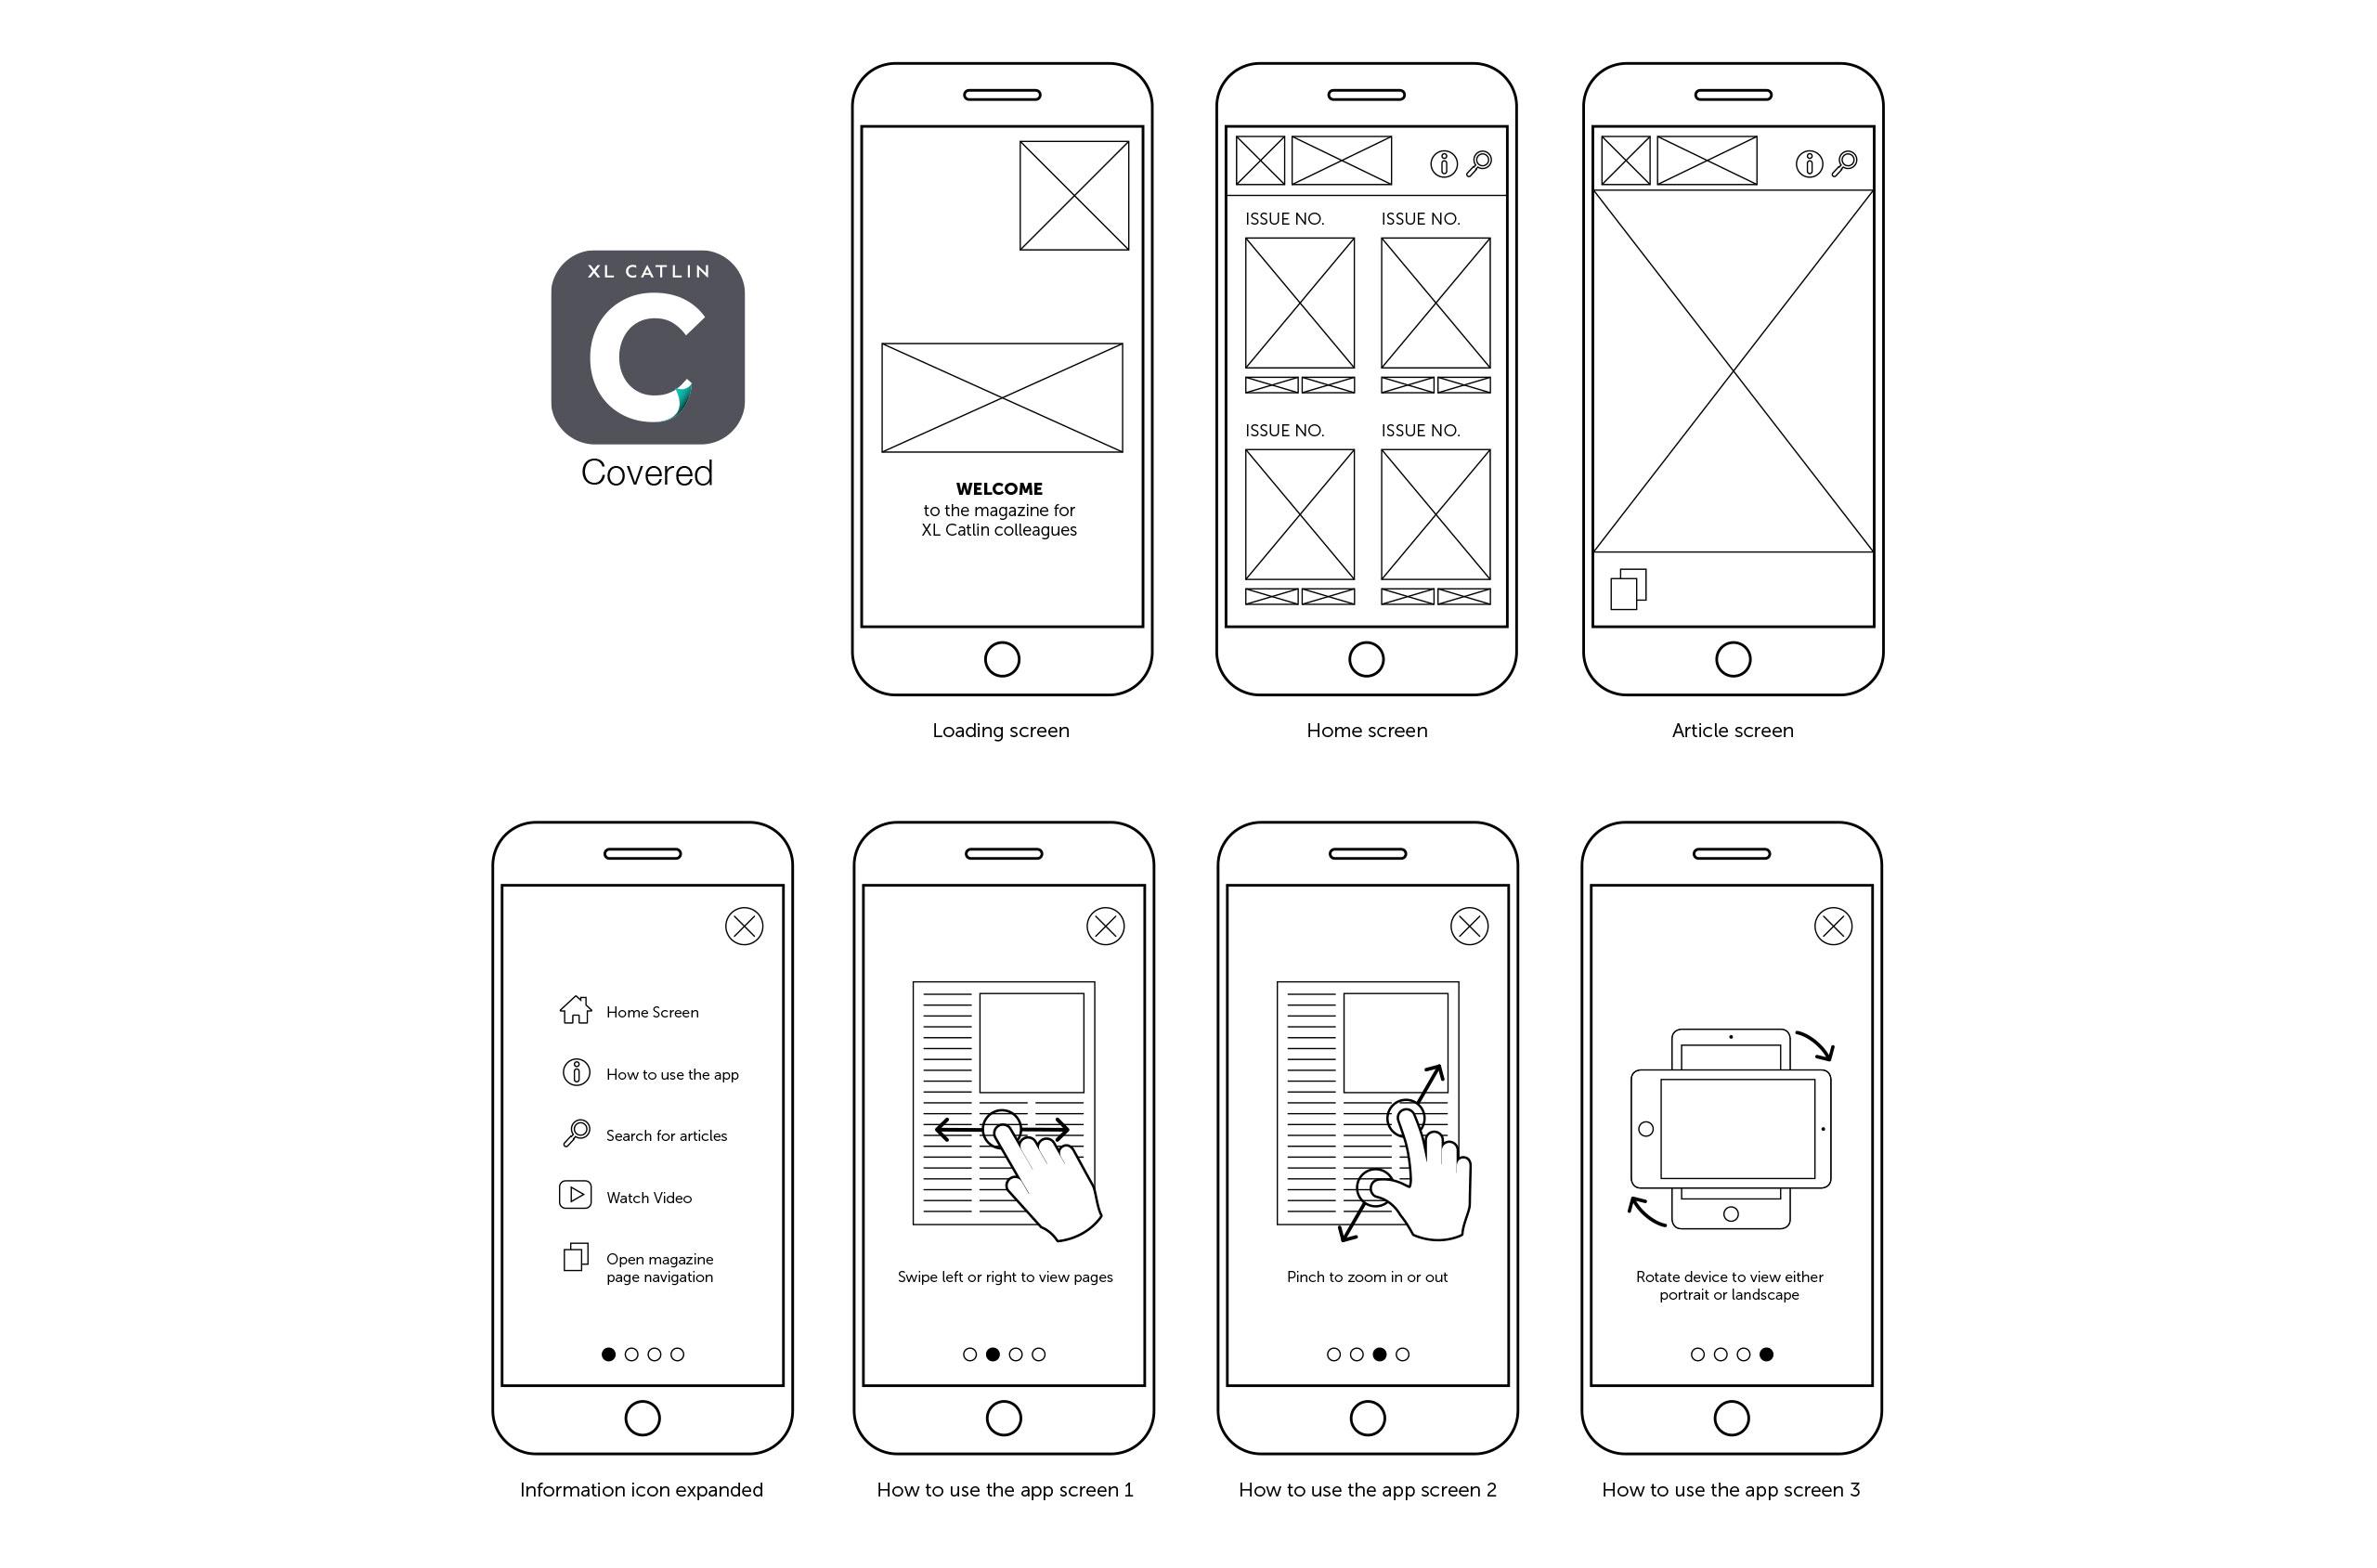 Glendale Creative XL Catlin App Wireframe